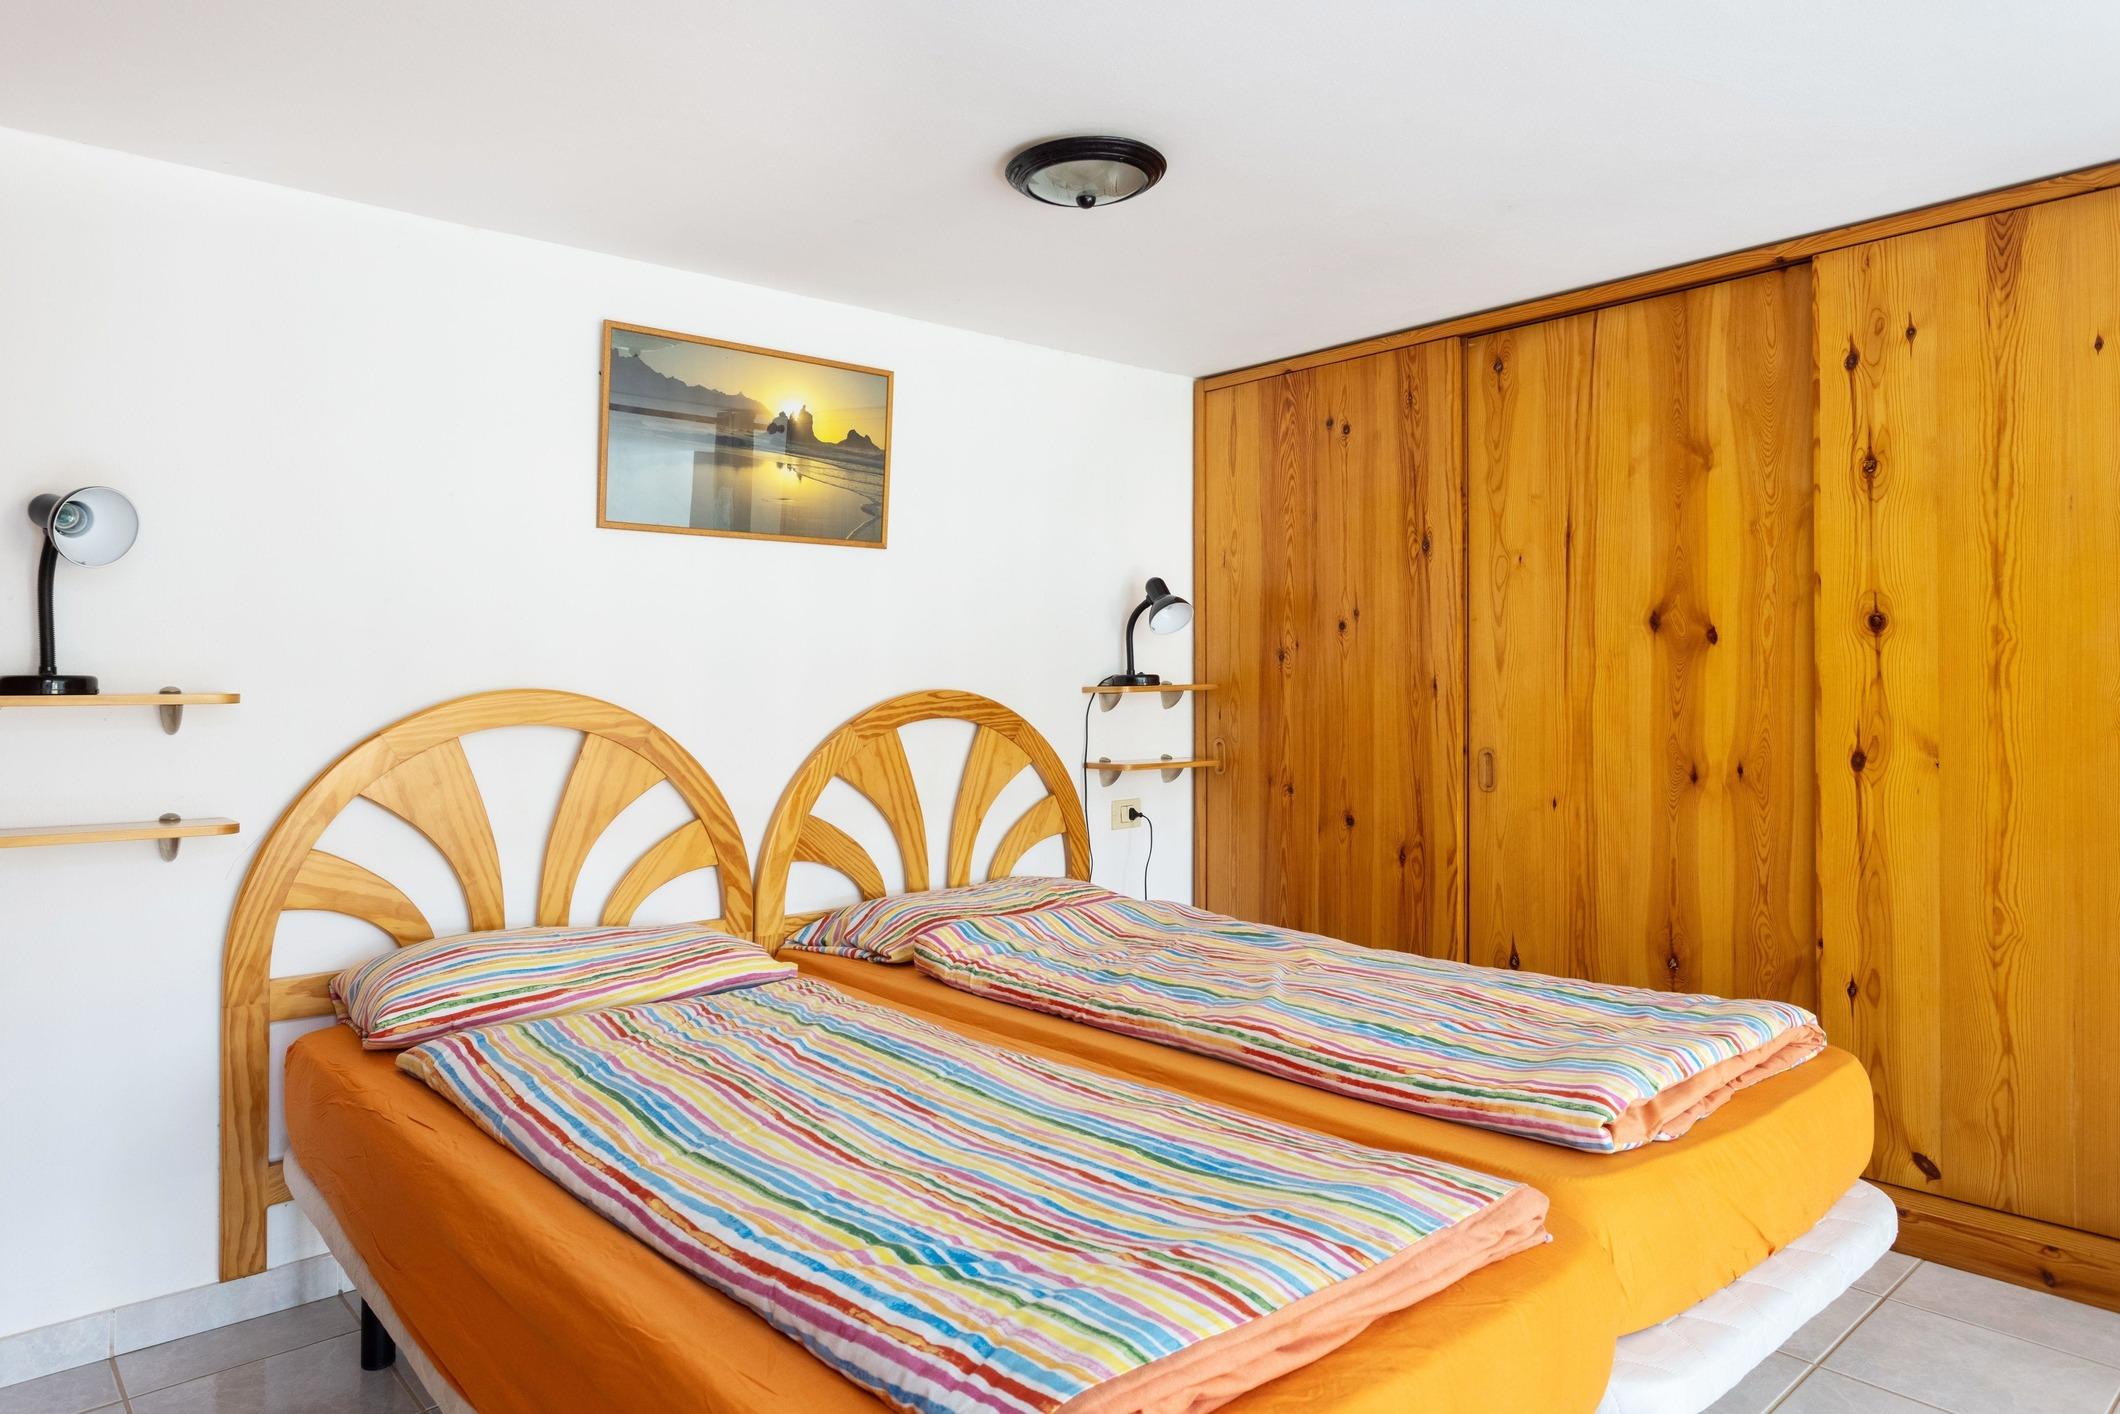 Appartement de vacances Fewo Strelitzia, im Grünen, am kleinen See, direkt am Strelitziengarten, mit Pool, Grill,  (2492987), Santa Ursula, Ténérife, Iles Canaries, Espagne, image 11